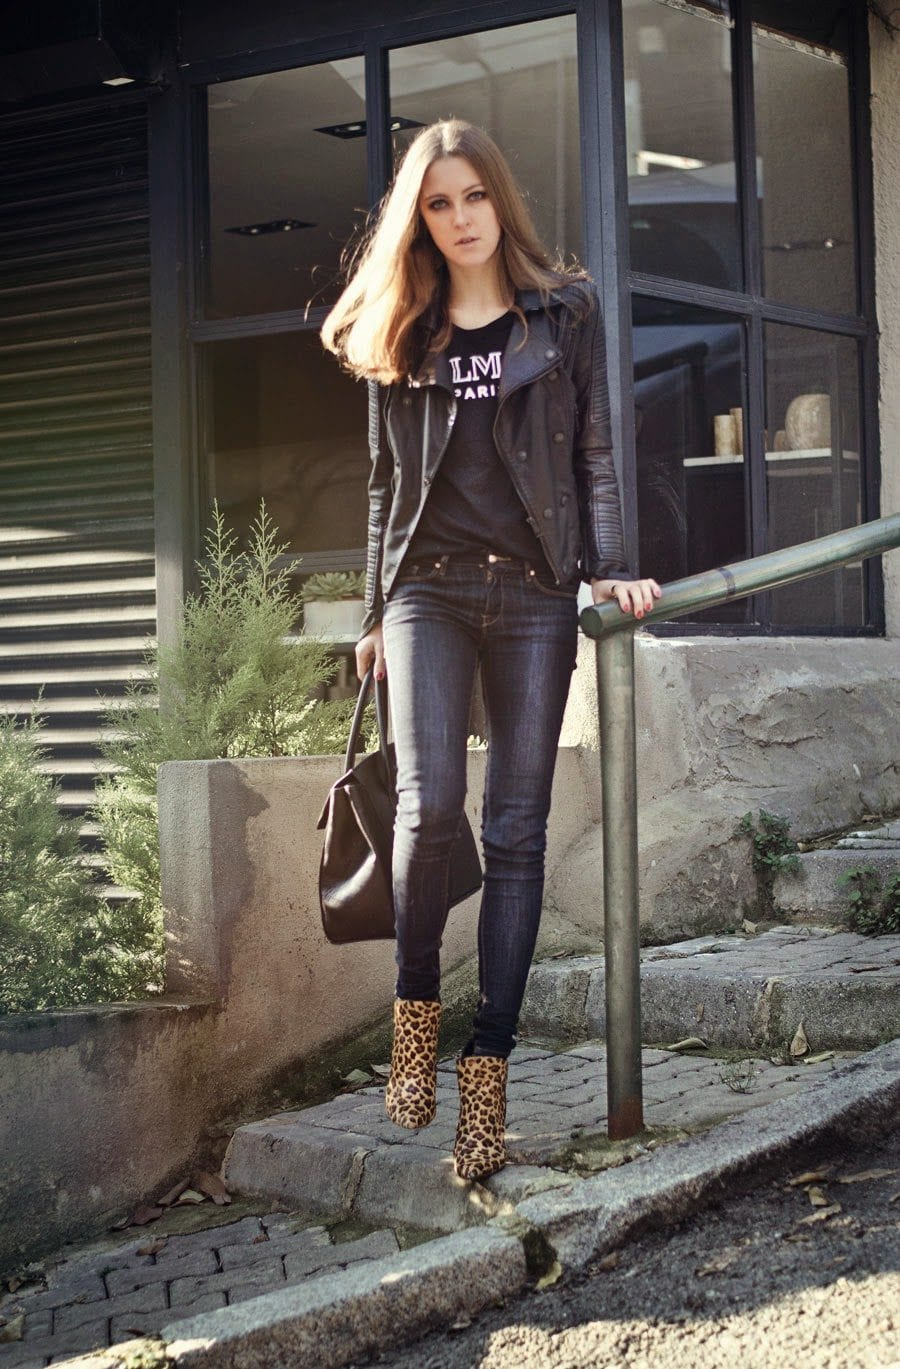 12-1 Rocker Chic Outfits-17 Ways To Dress Like a Rocker Chic